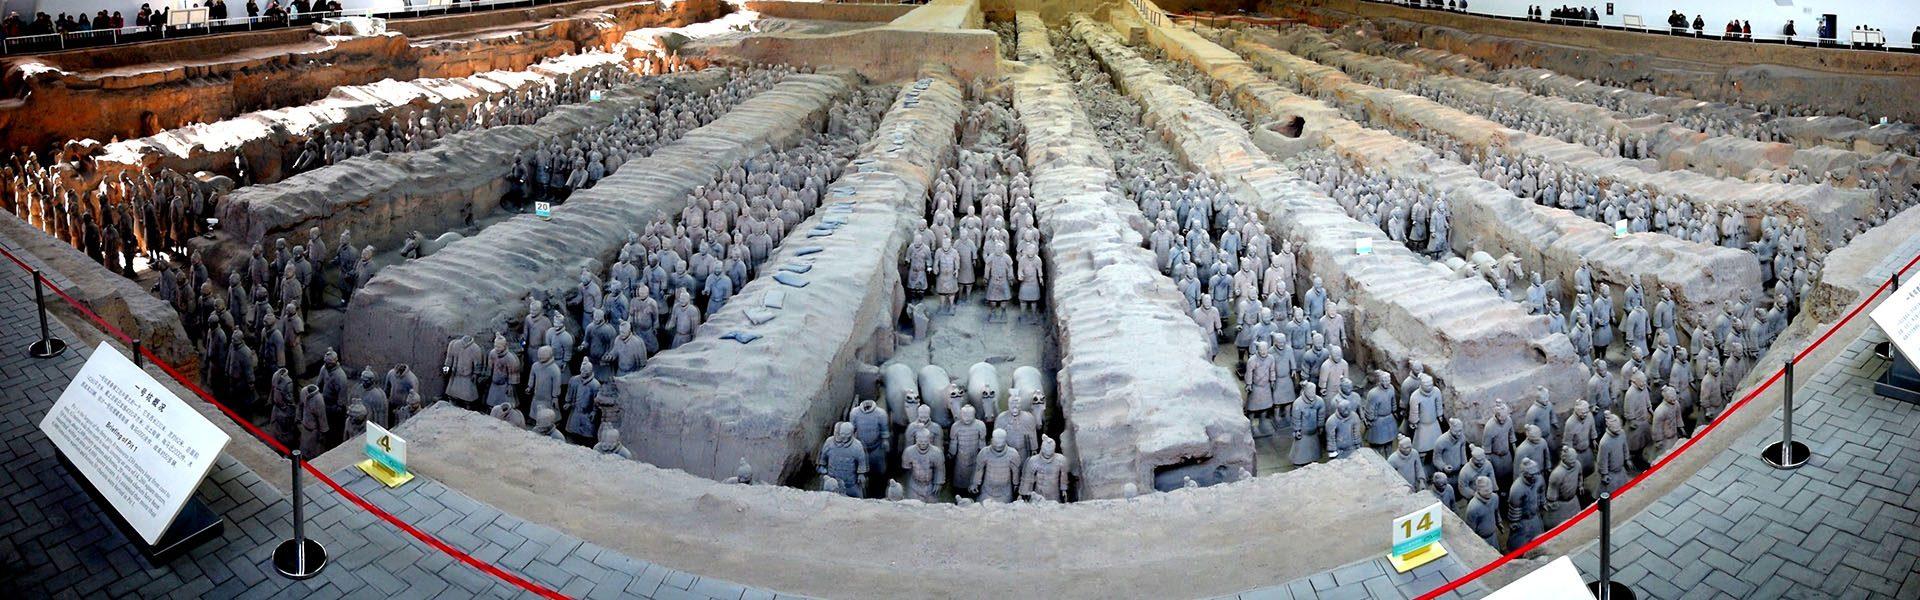 Rows of Terracotta Soldiers in Xian